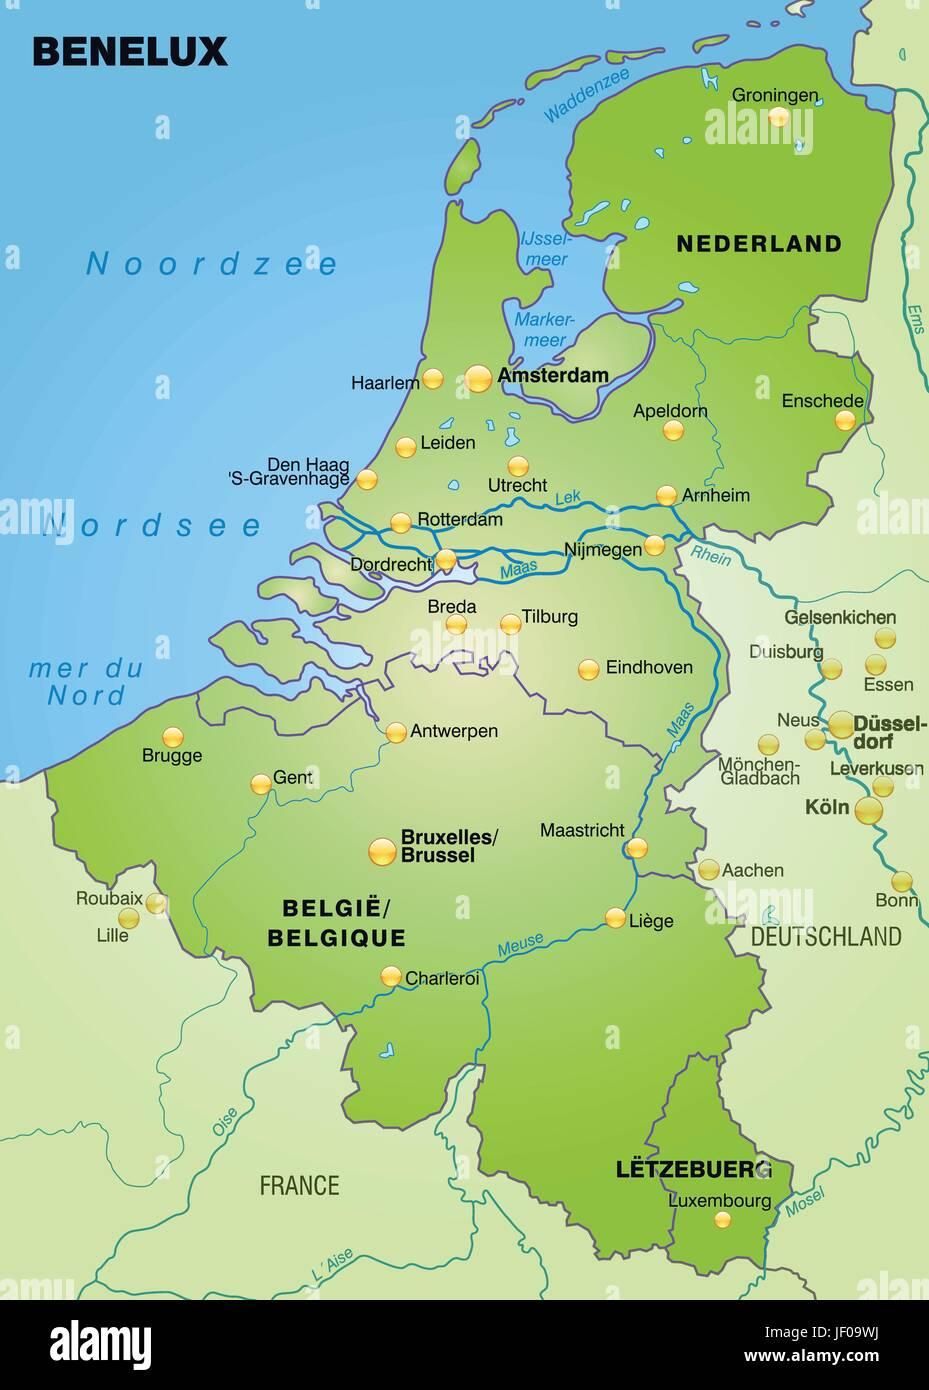 Card atlas map of the world map belgium netherlands benelux card atlas map of the world map belgium netherlands benelux border gumiabroncs Images